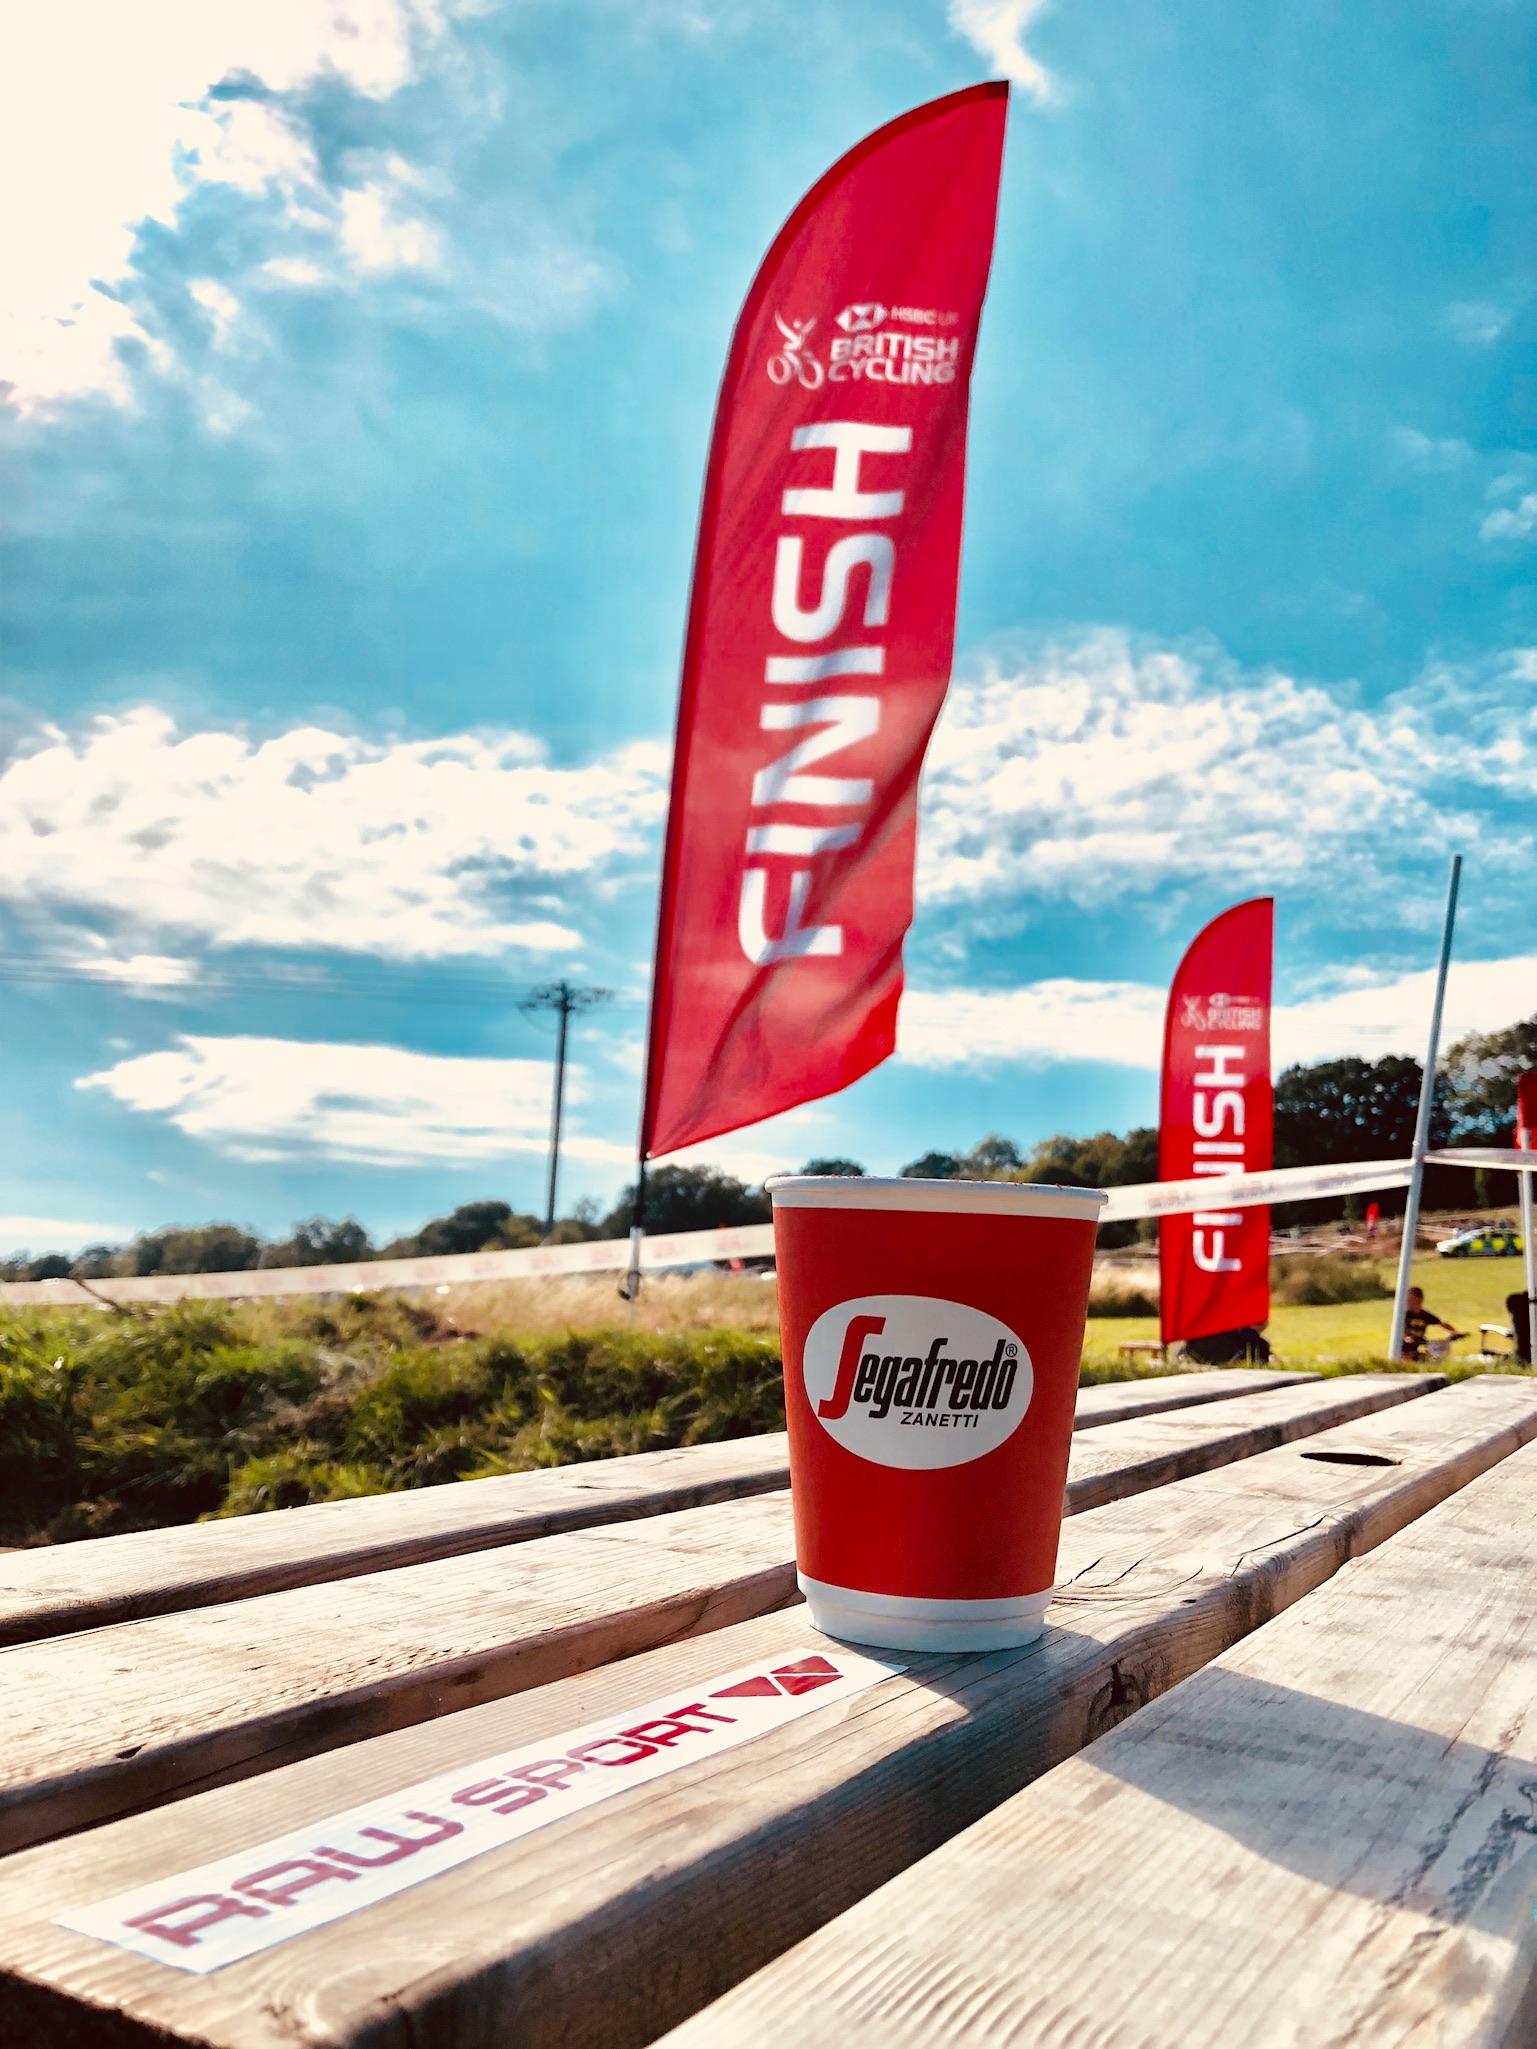 British Cycling Segafredo coffee arty picture